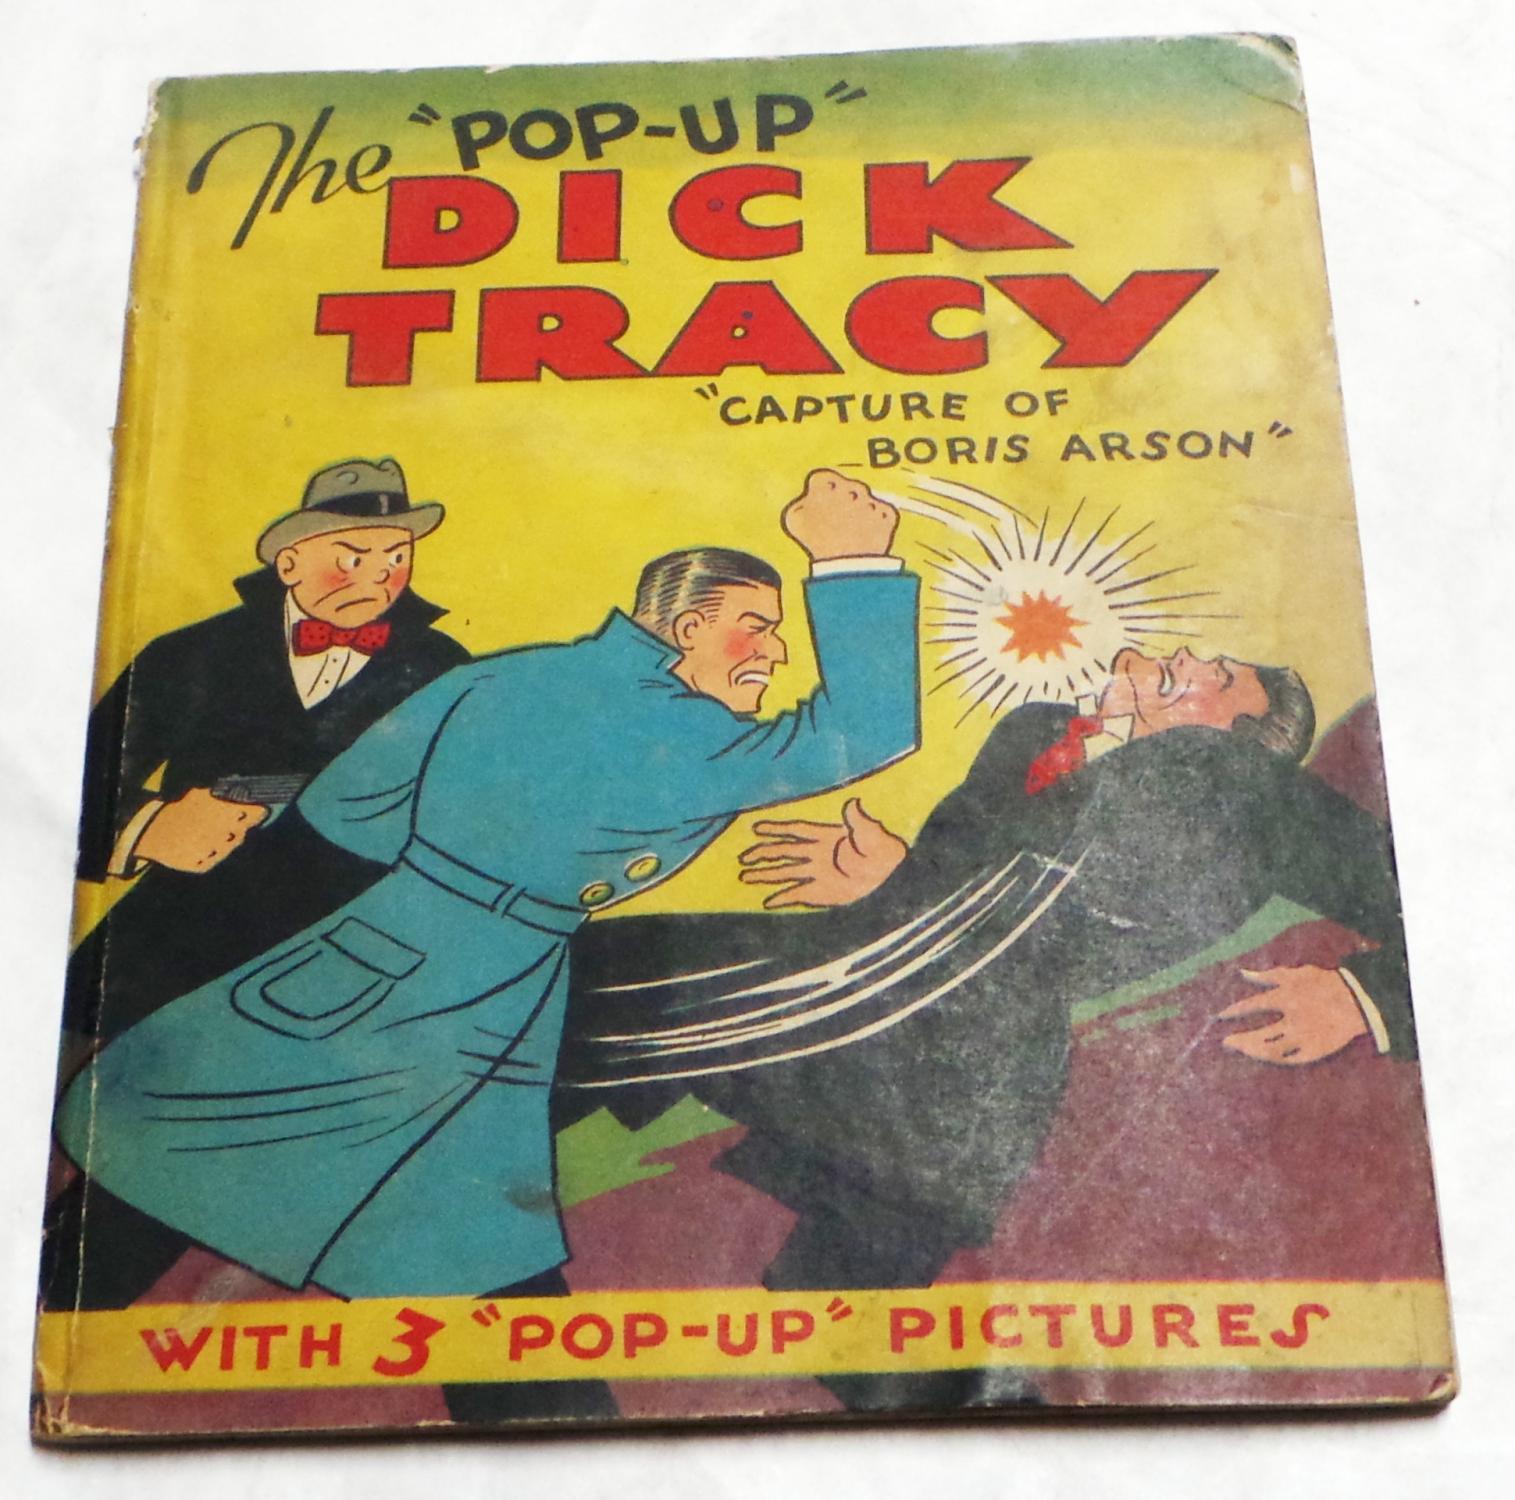 show Dick tracy art